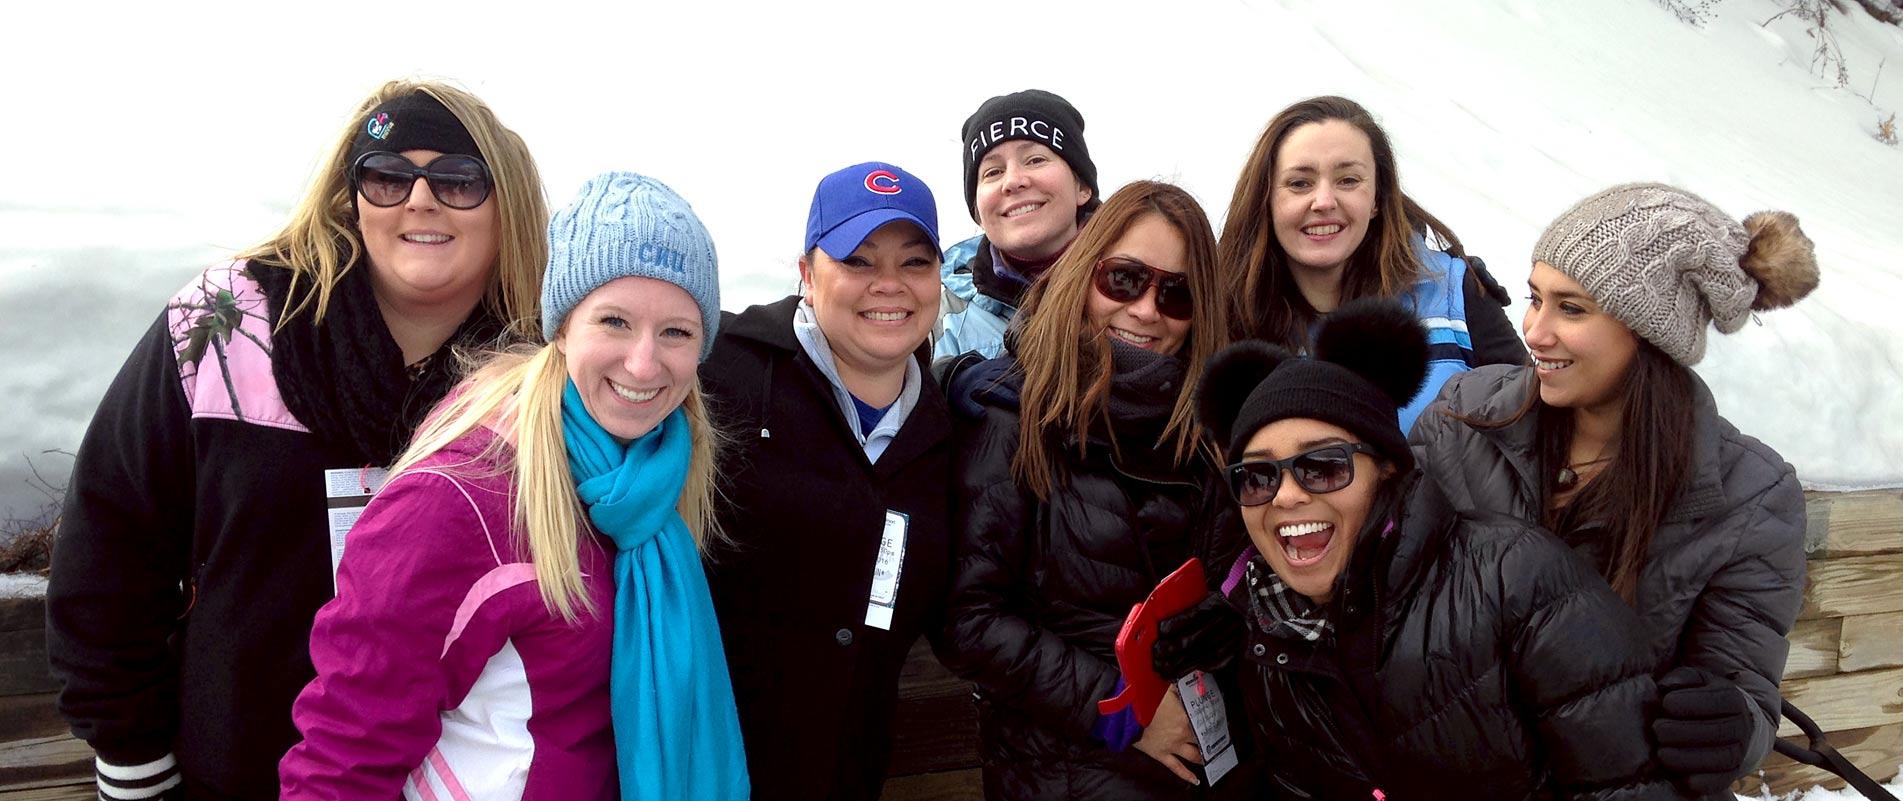 Fellowship Travel employees - Tubing at Wintergreen